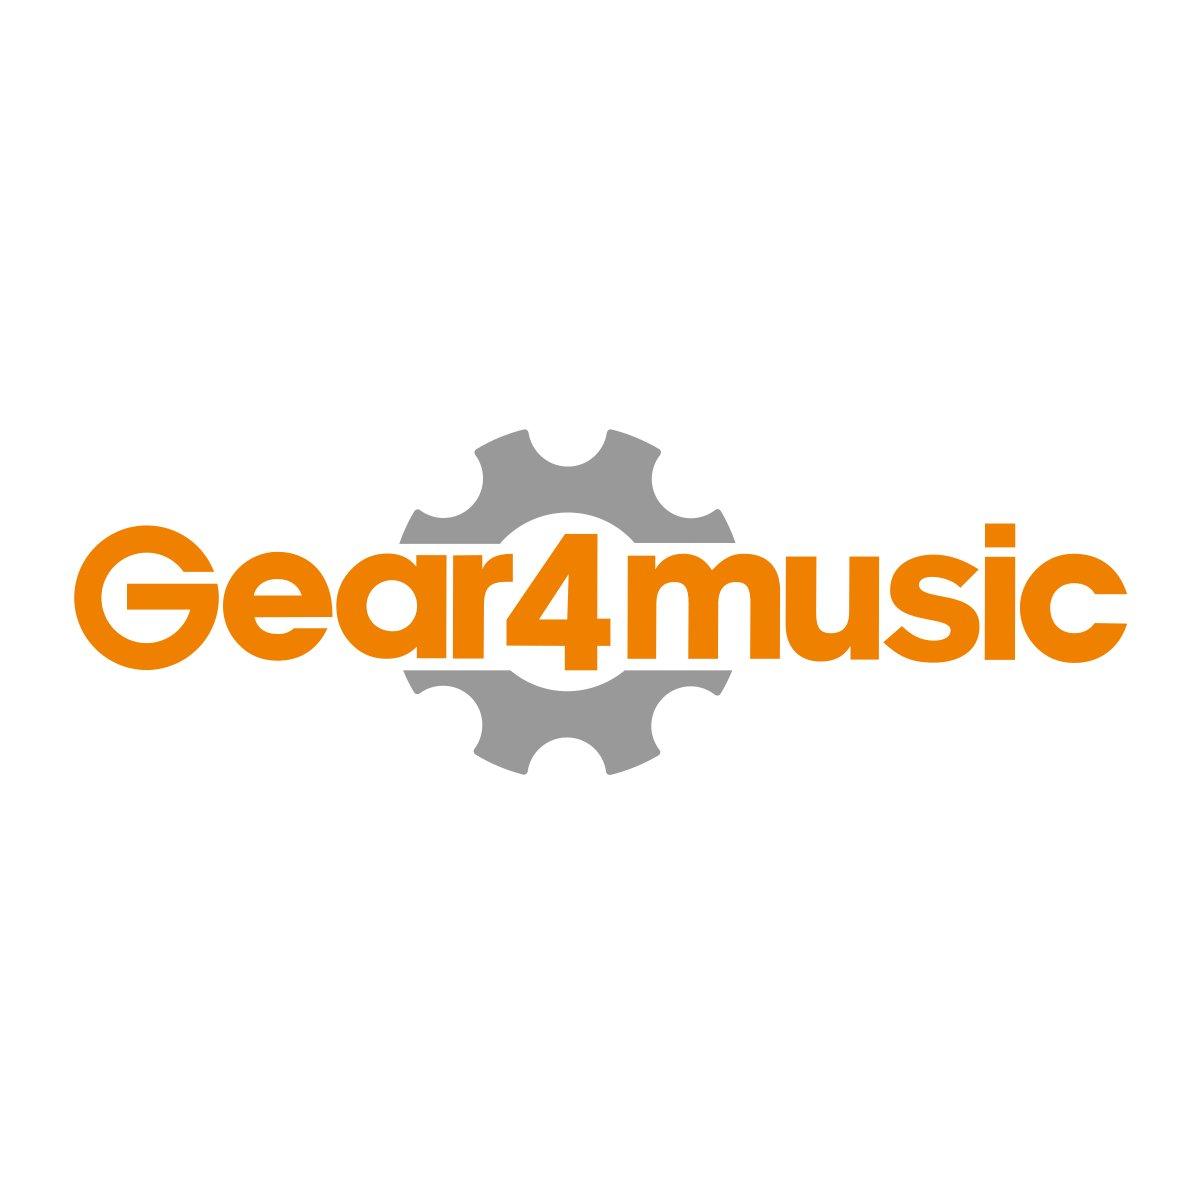 ce8a33694f9 Franse hoorn tassen & koffers beschikbaar voor verkoop op Gear4Music.com